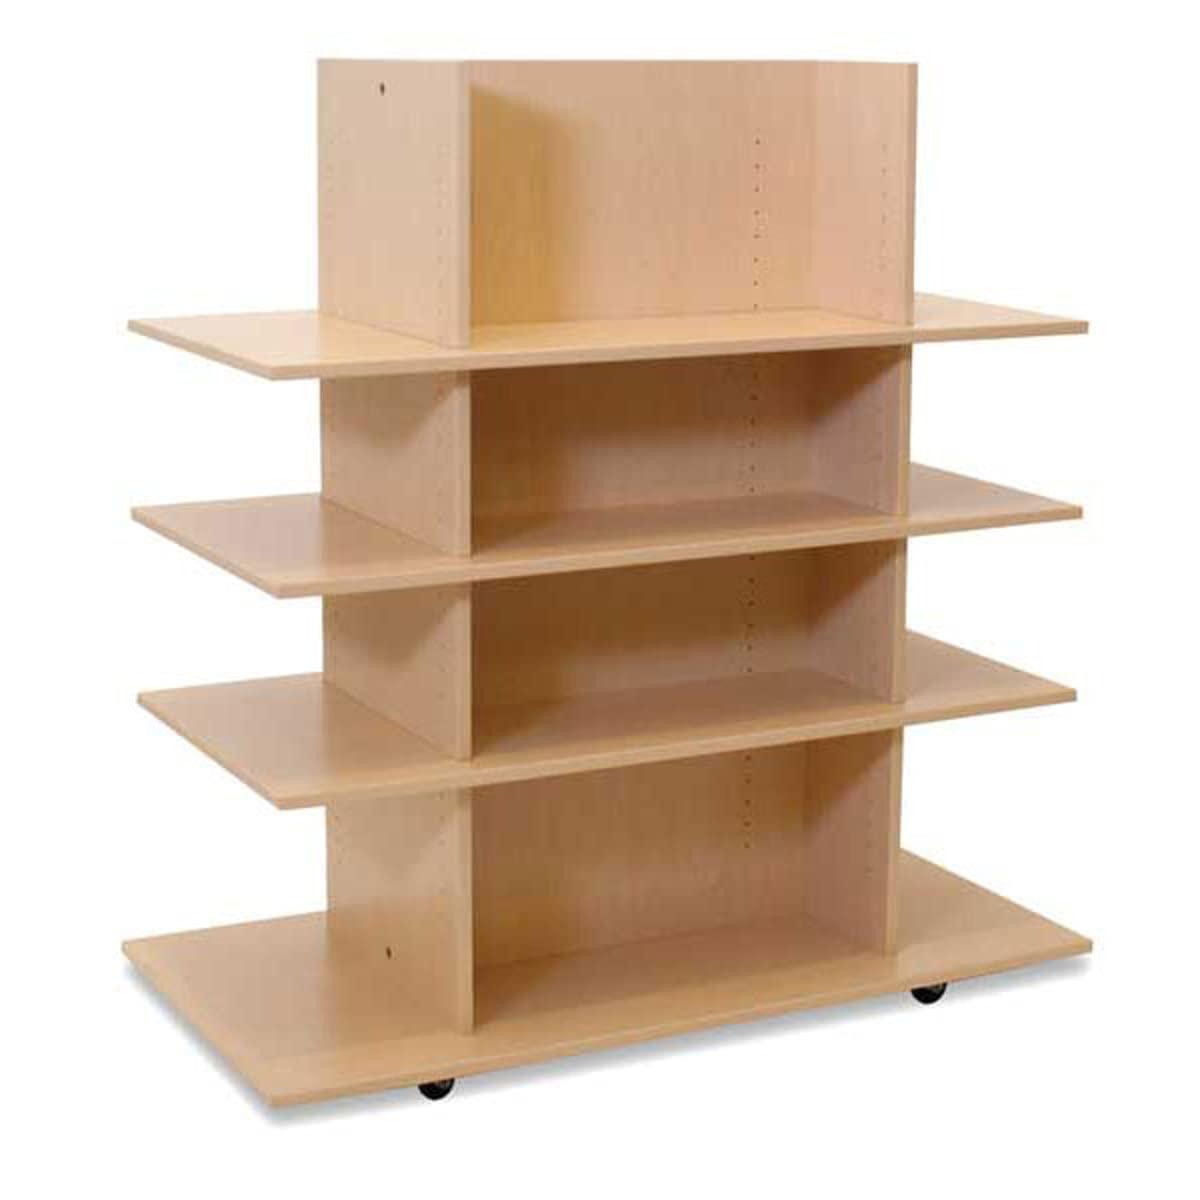 Mail order Merchandiser Knock Down Bargain sale with 3 Maple Shelves D W x 52.5 24 48